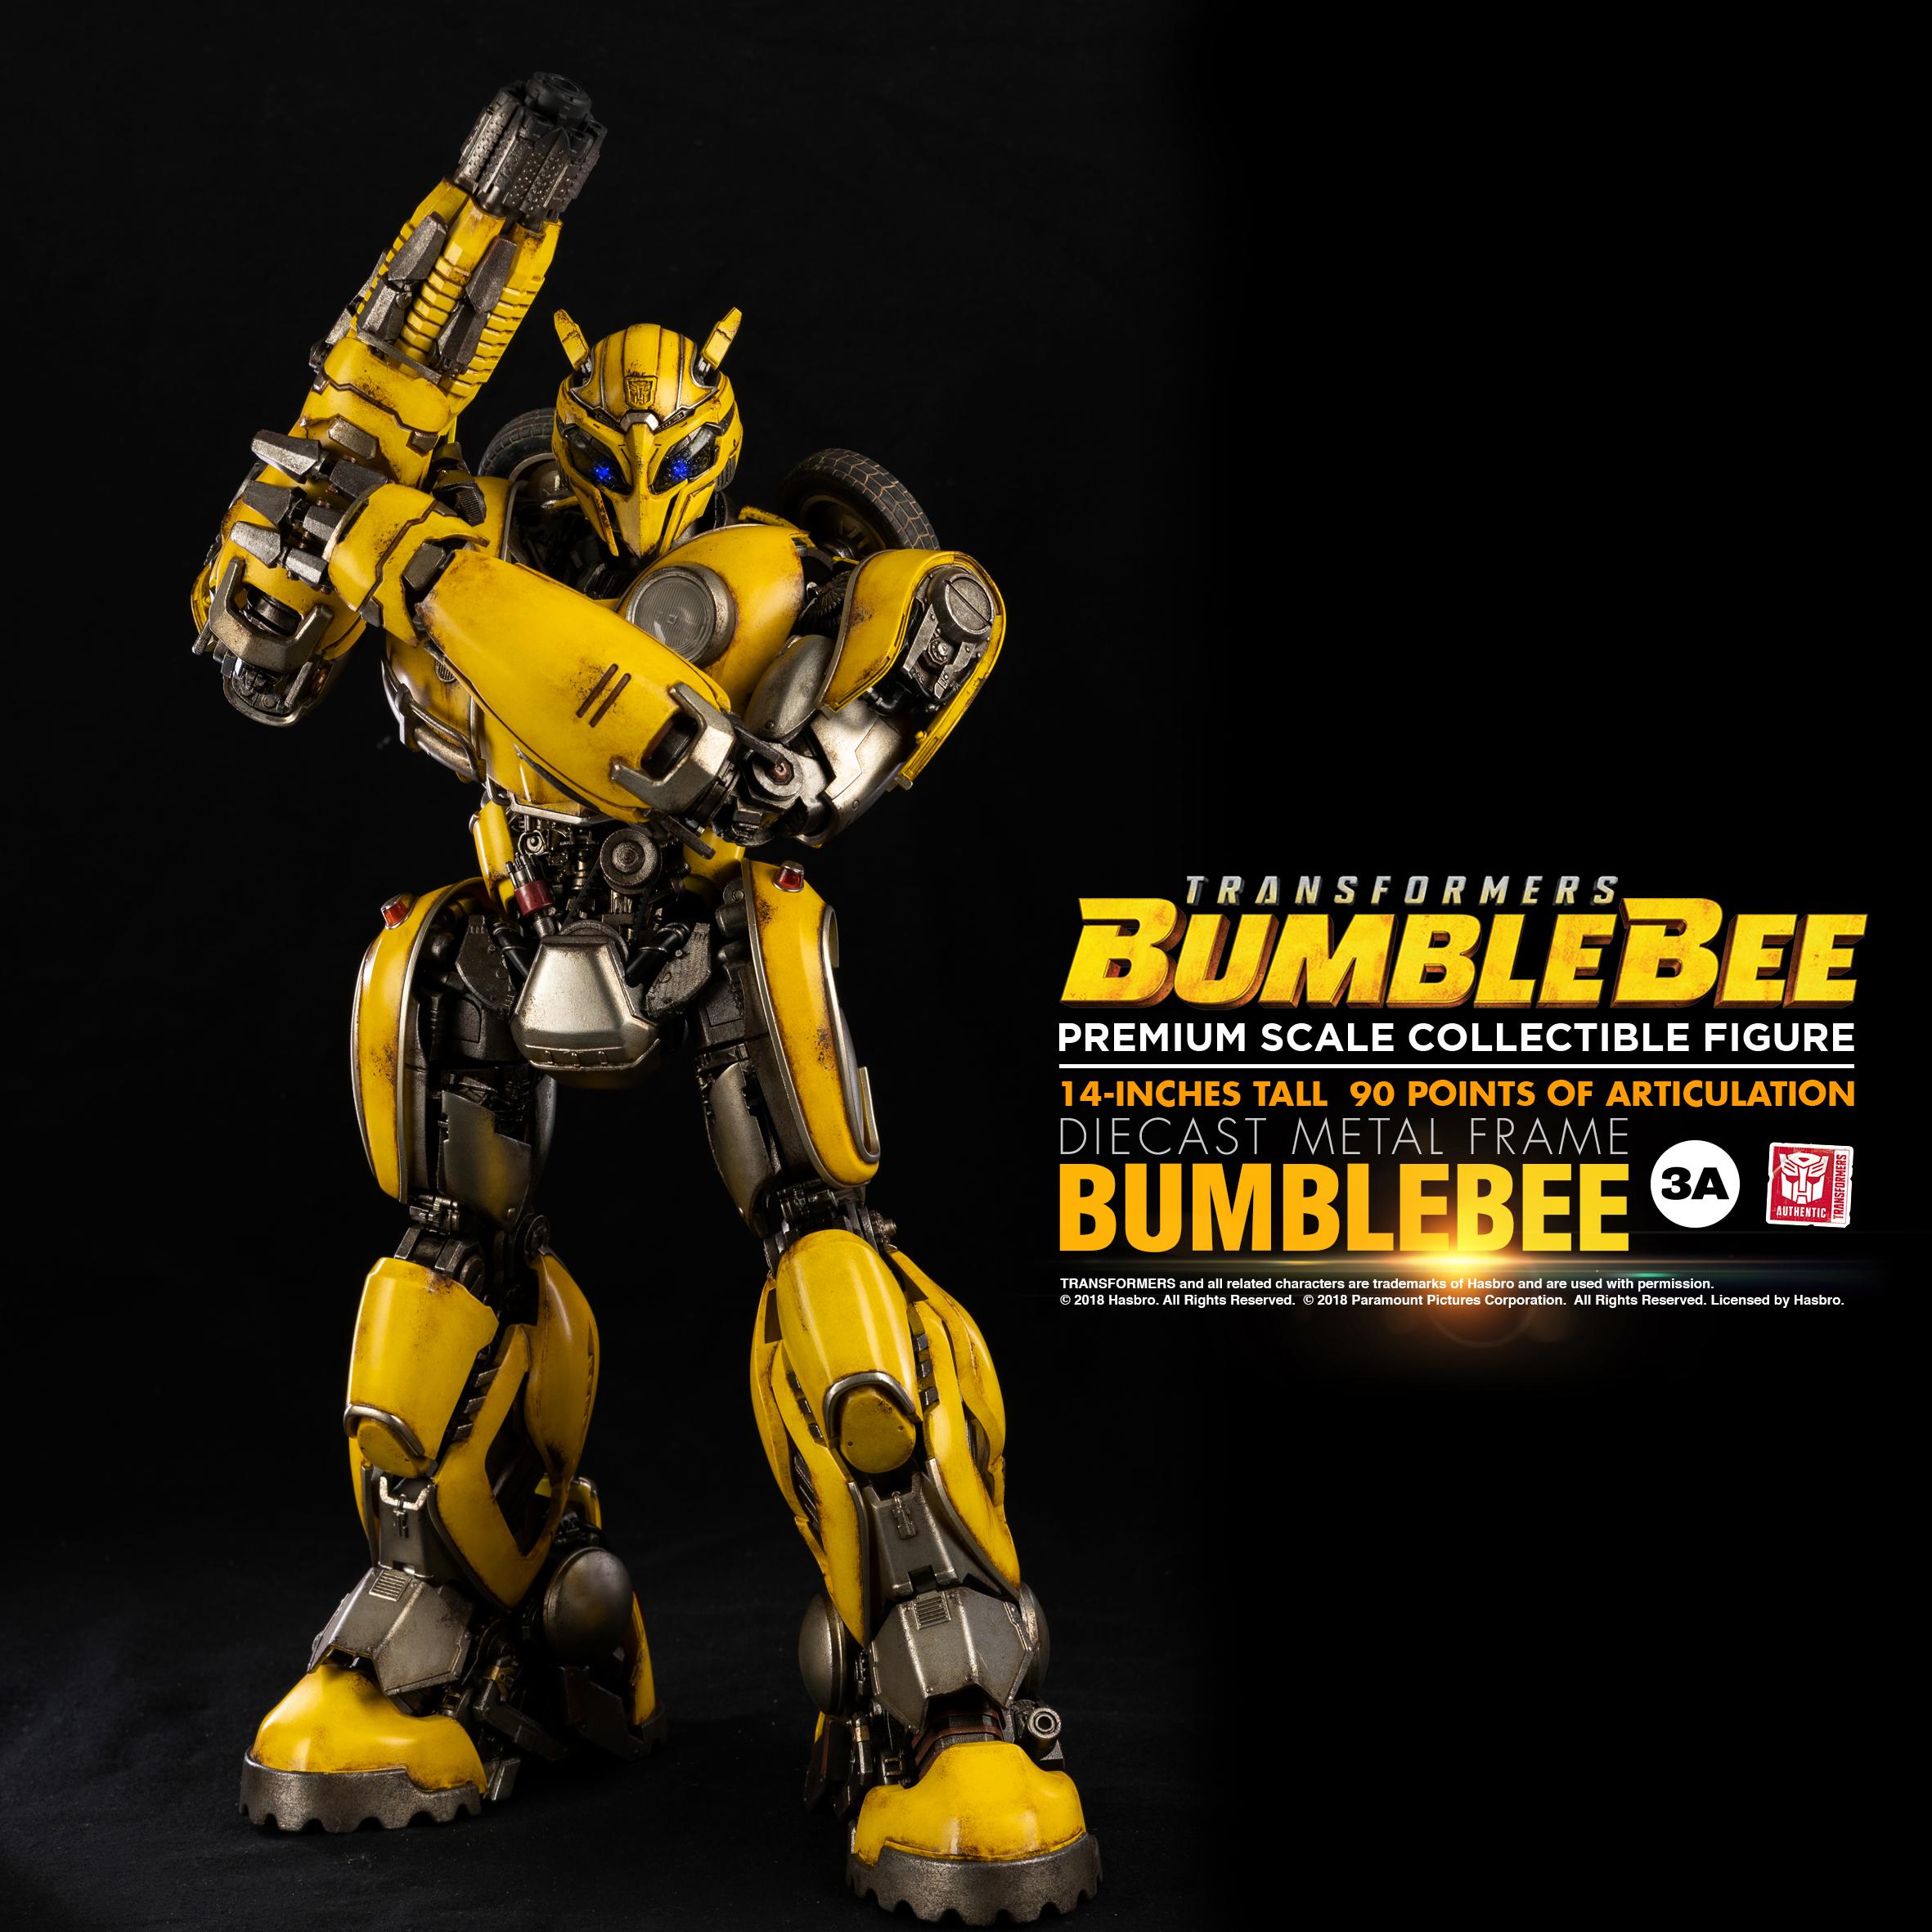 Bumblebee_ENG_PM_SQUARE_008.jpg